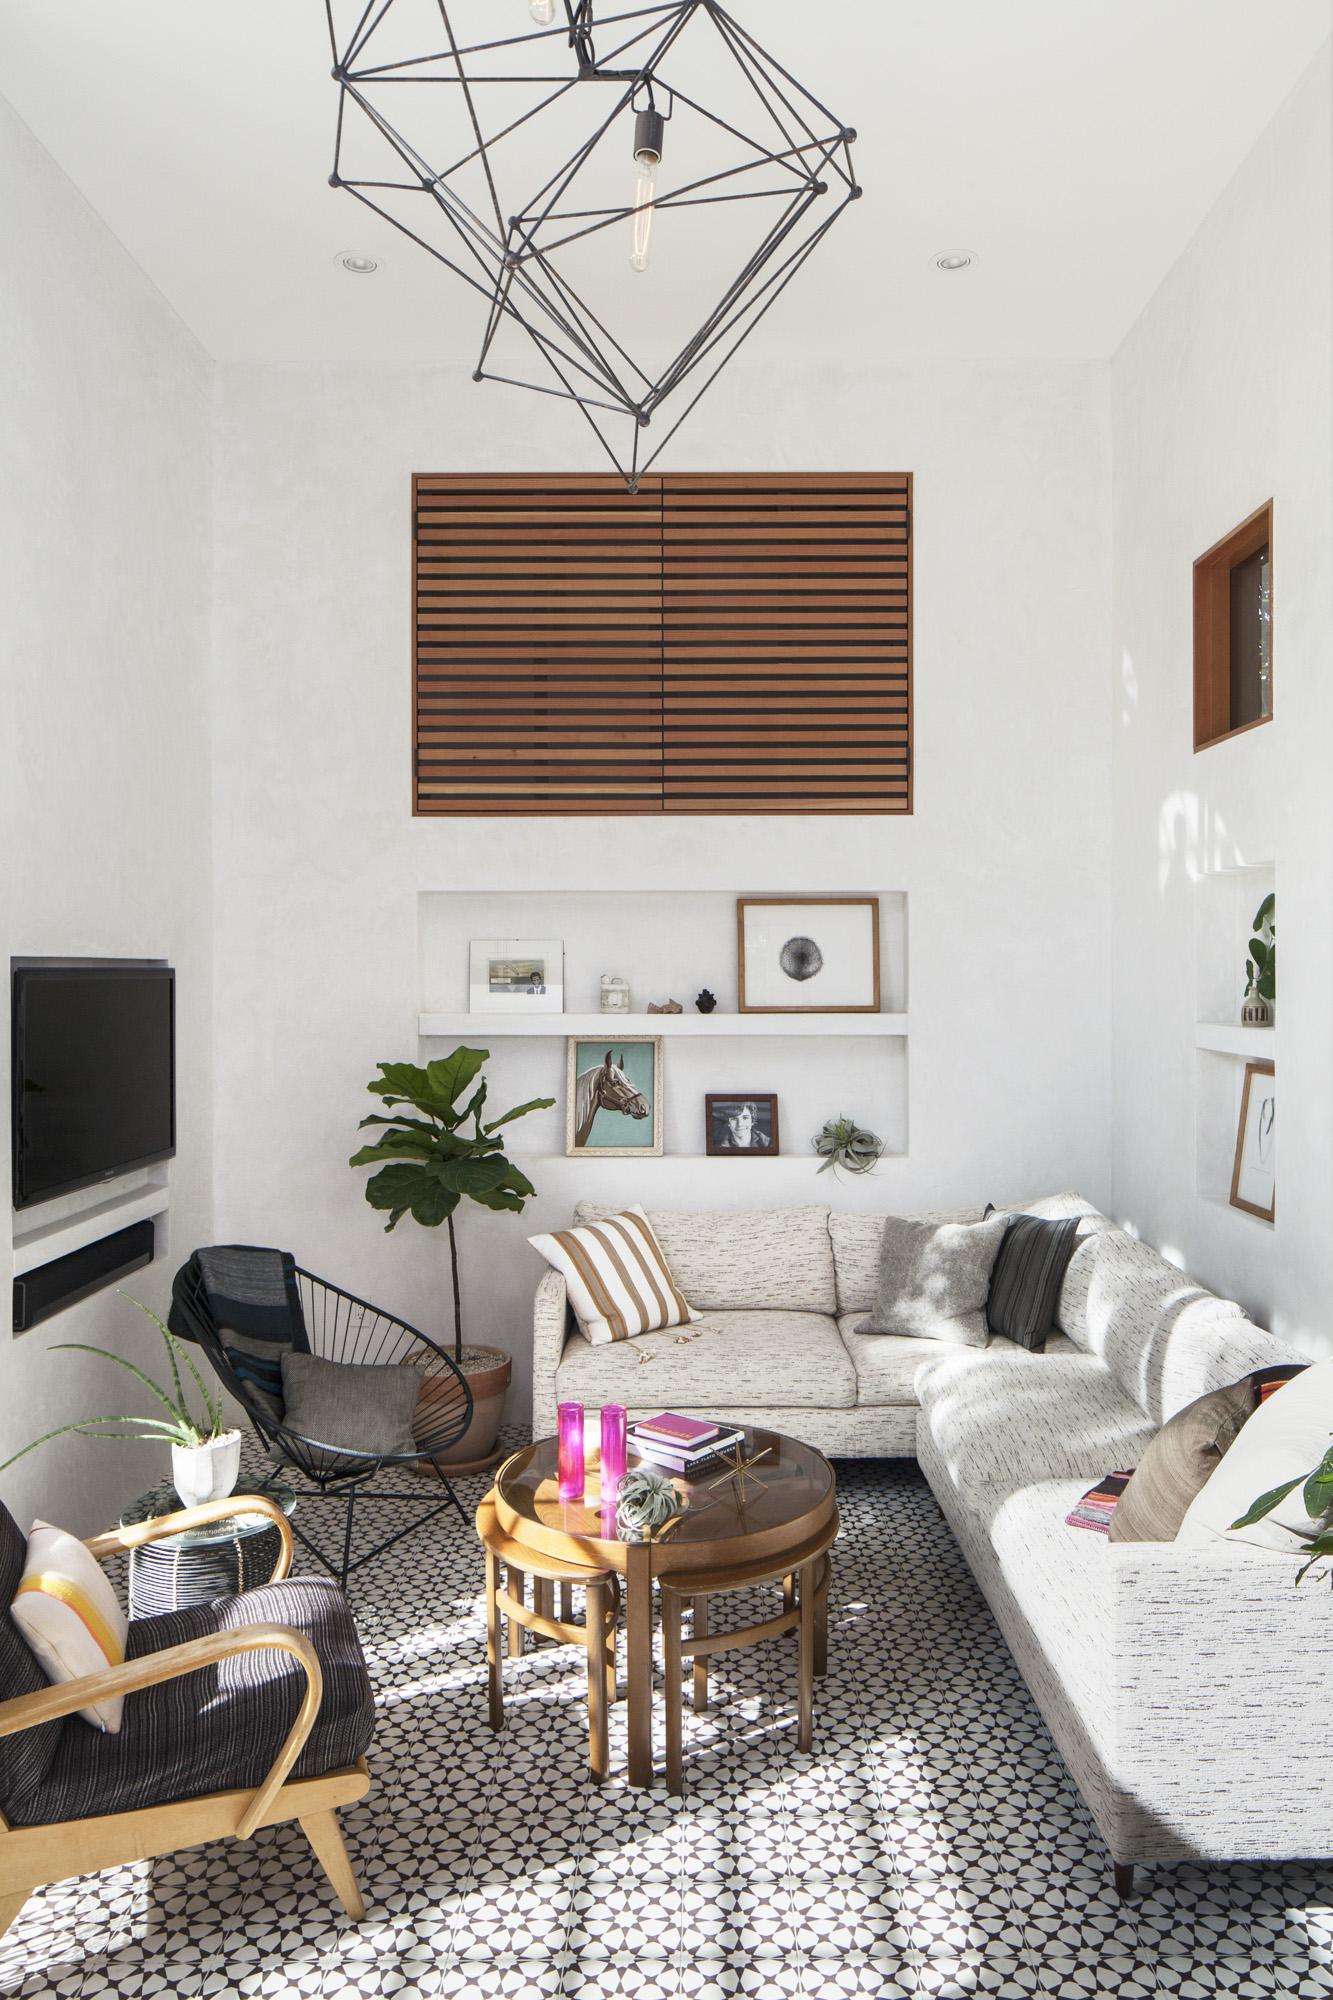 Elizabeth-Baird-Architecture-Garner Pool and Casita- casita living room 2.jpg